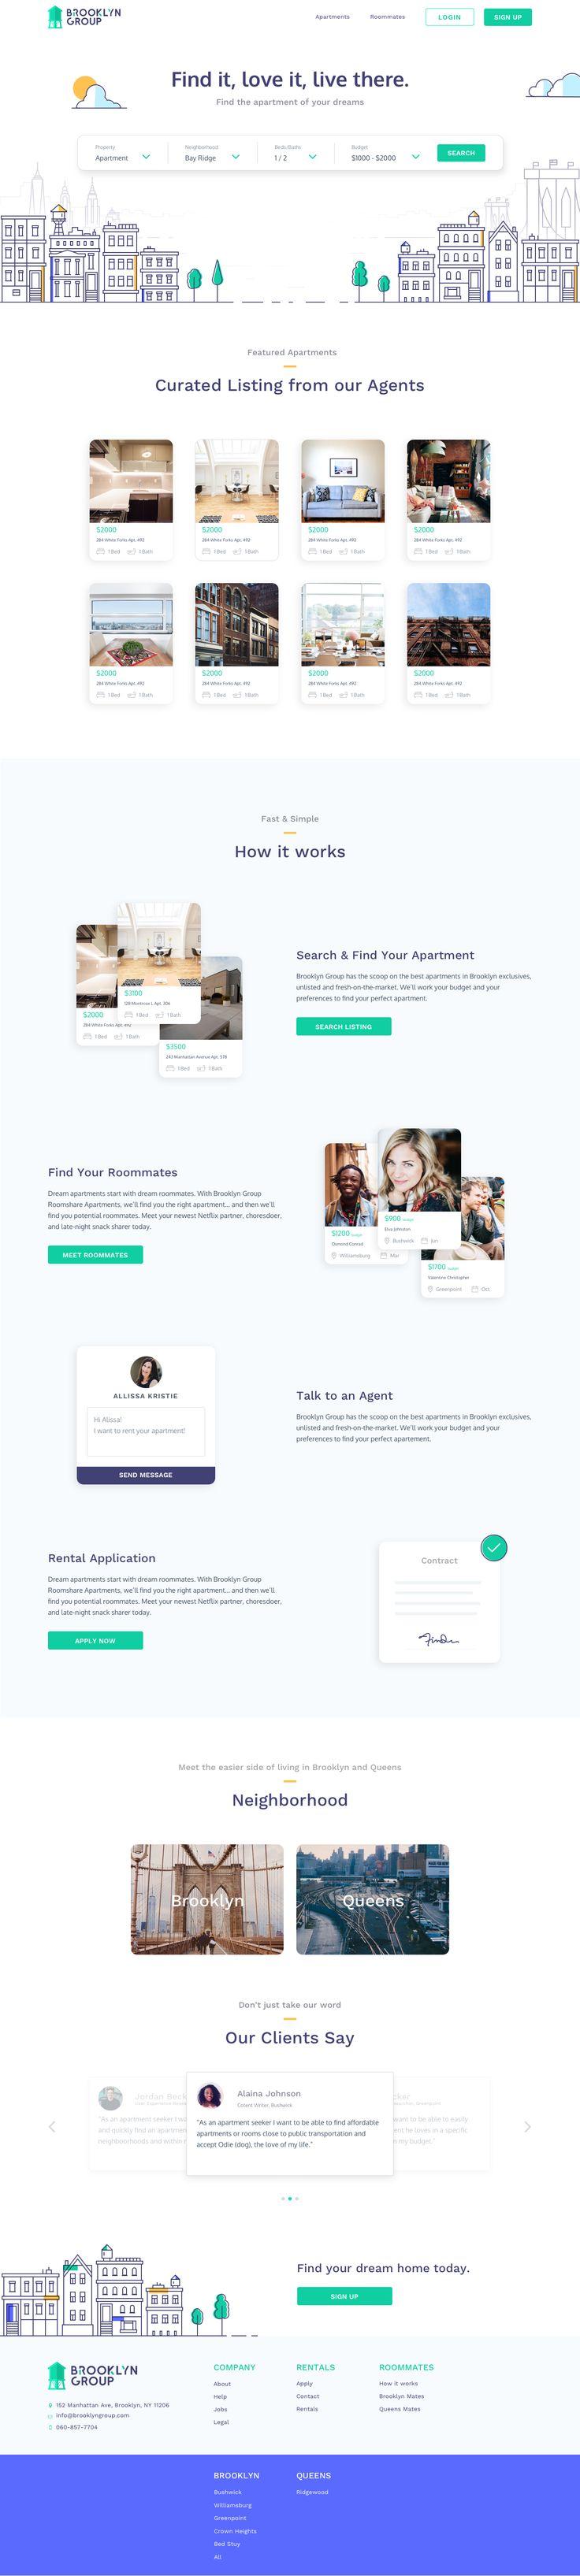 Apartment Rental Website | #ui #ux #userexperience #website #webdesign #design #minimal #minimalism #art #white #orange #blue #travel #map #ecommerce #fashion